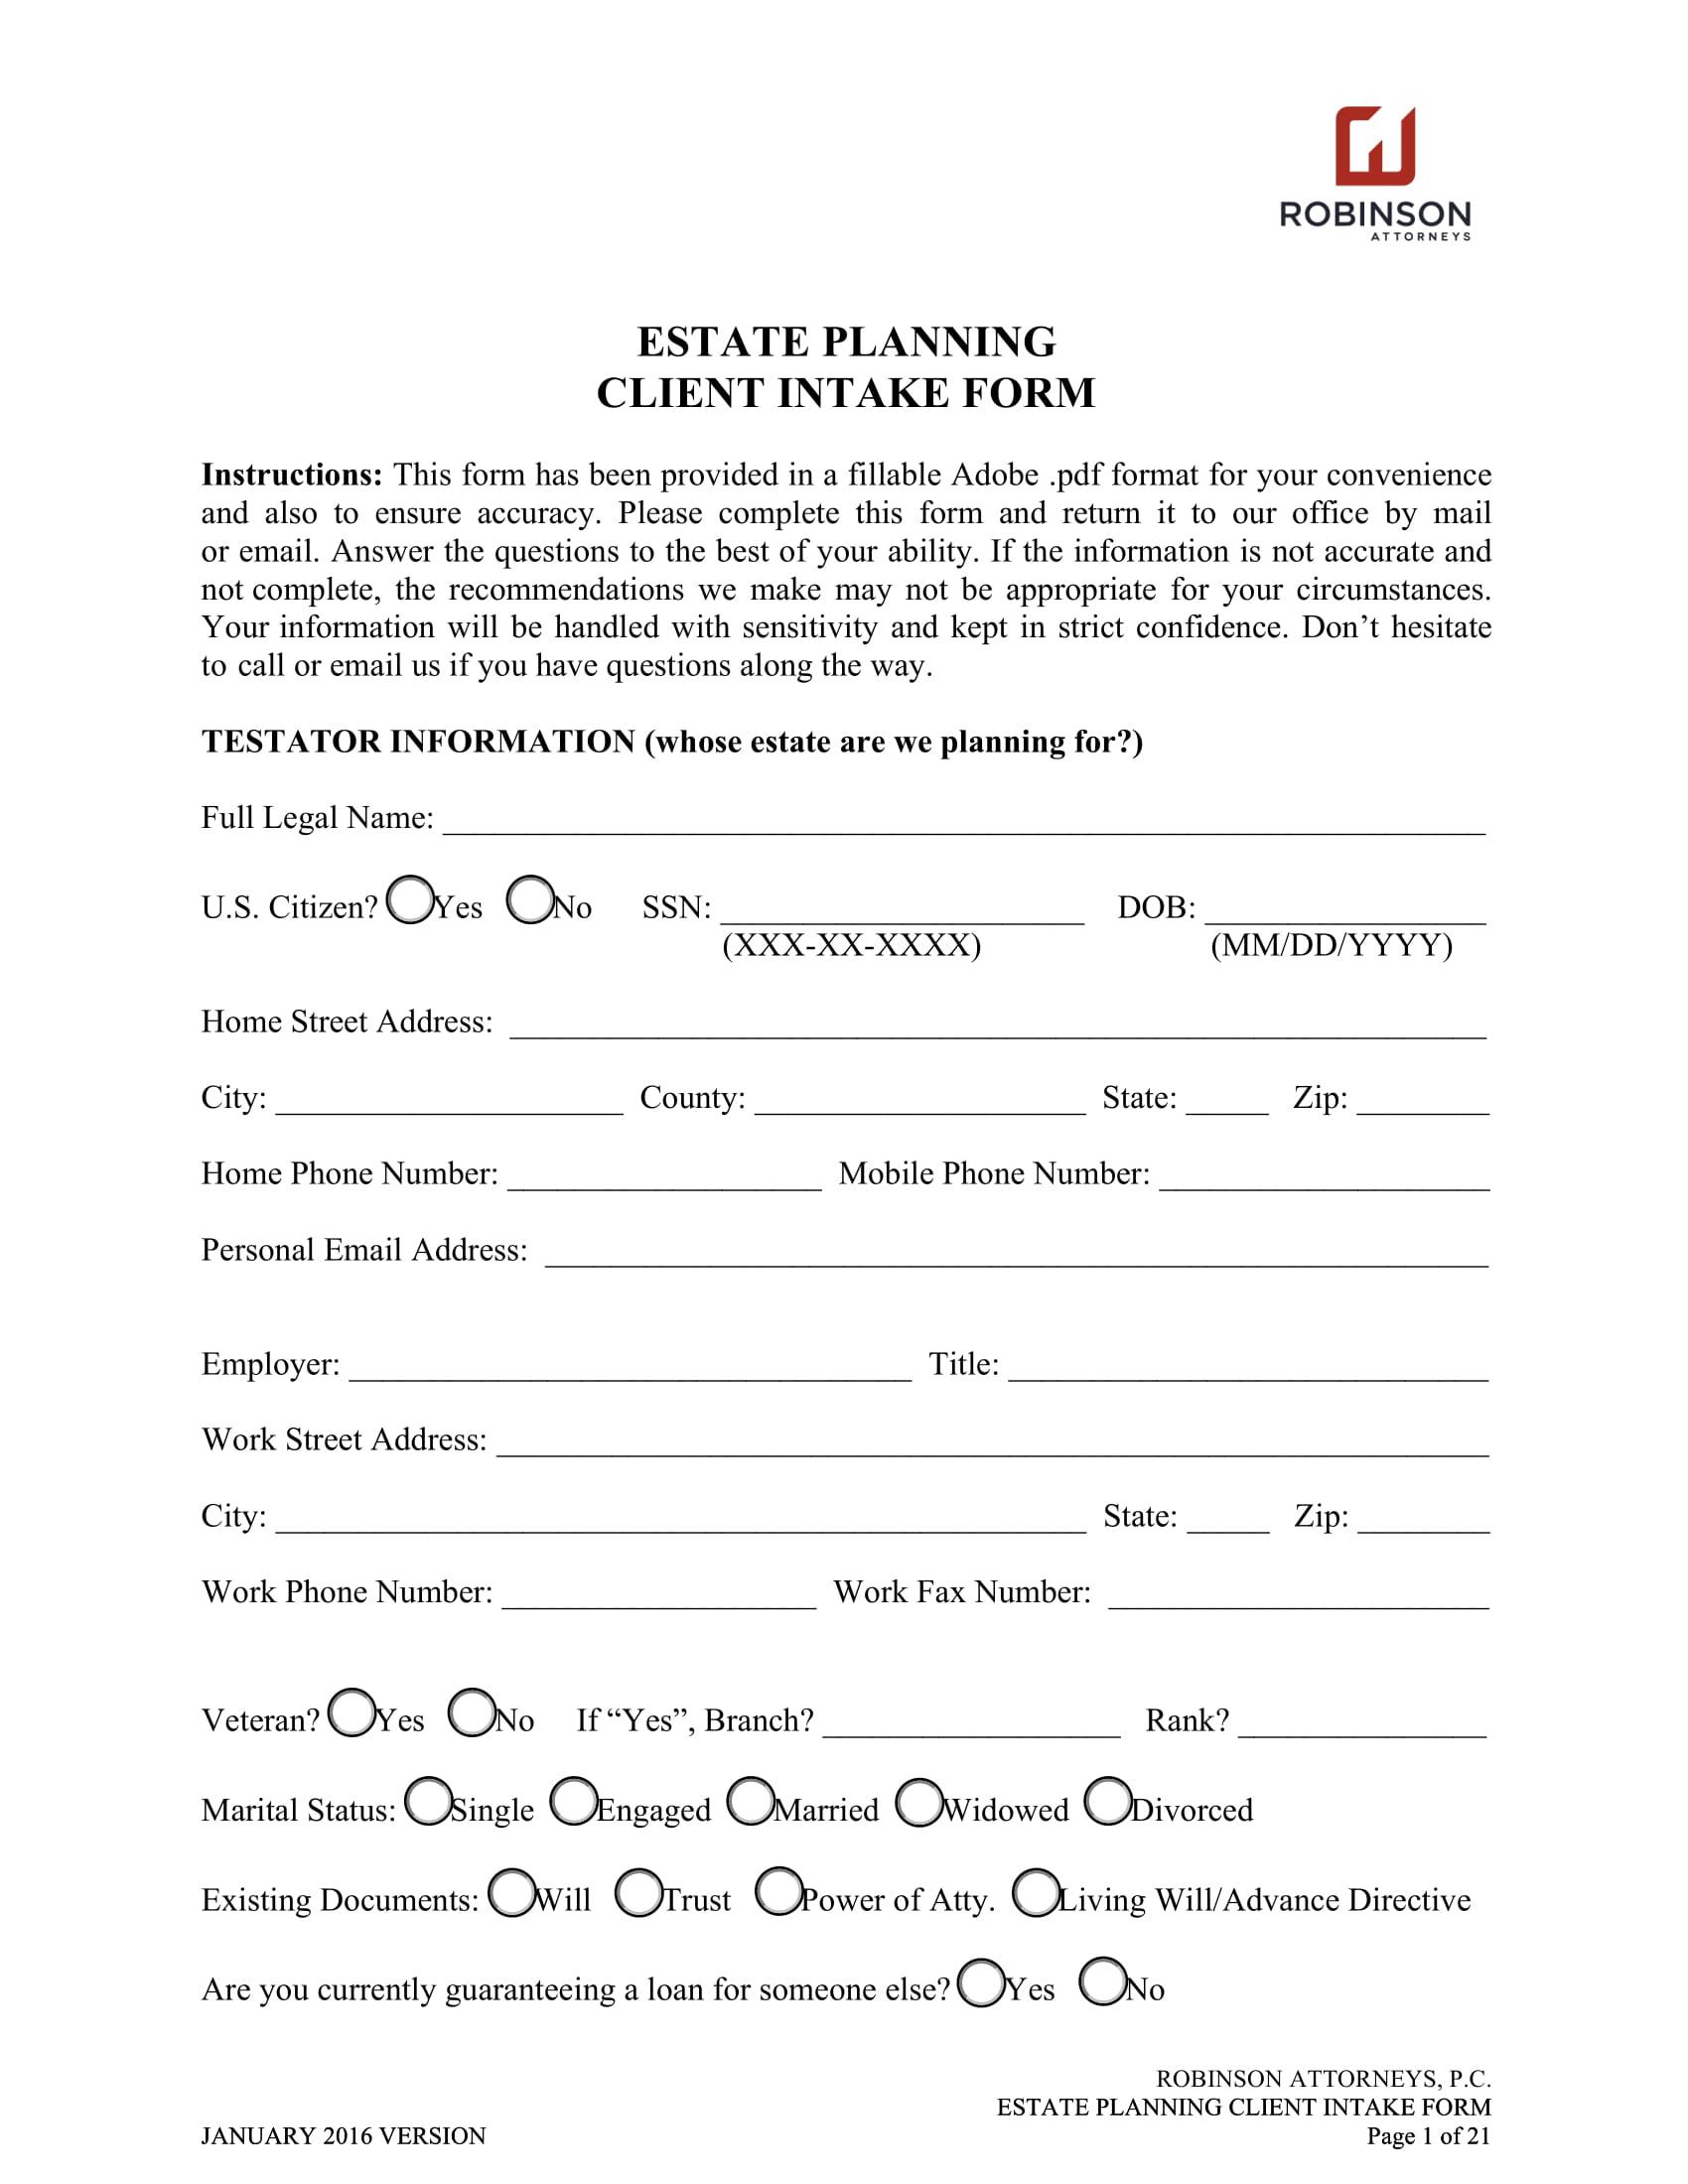 estate planning client intake form 01